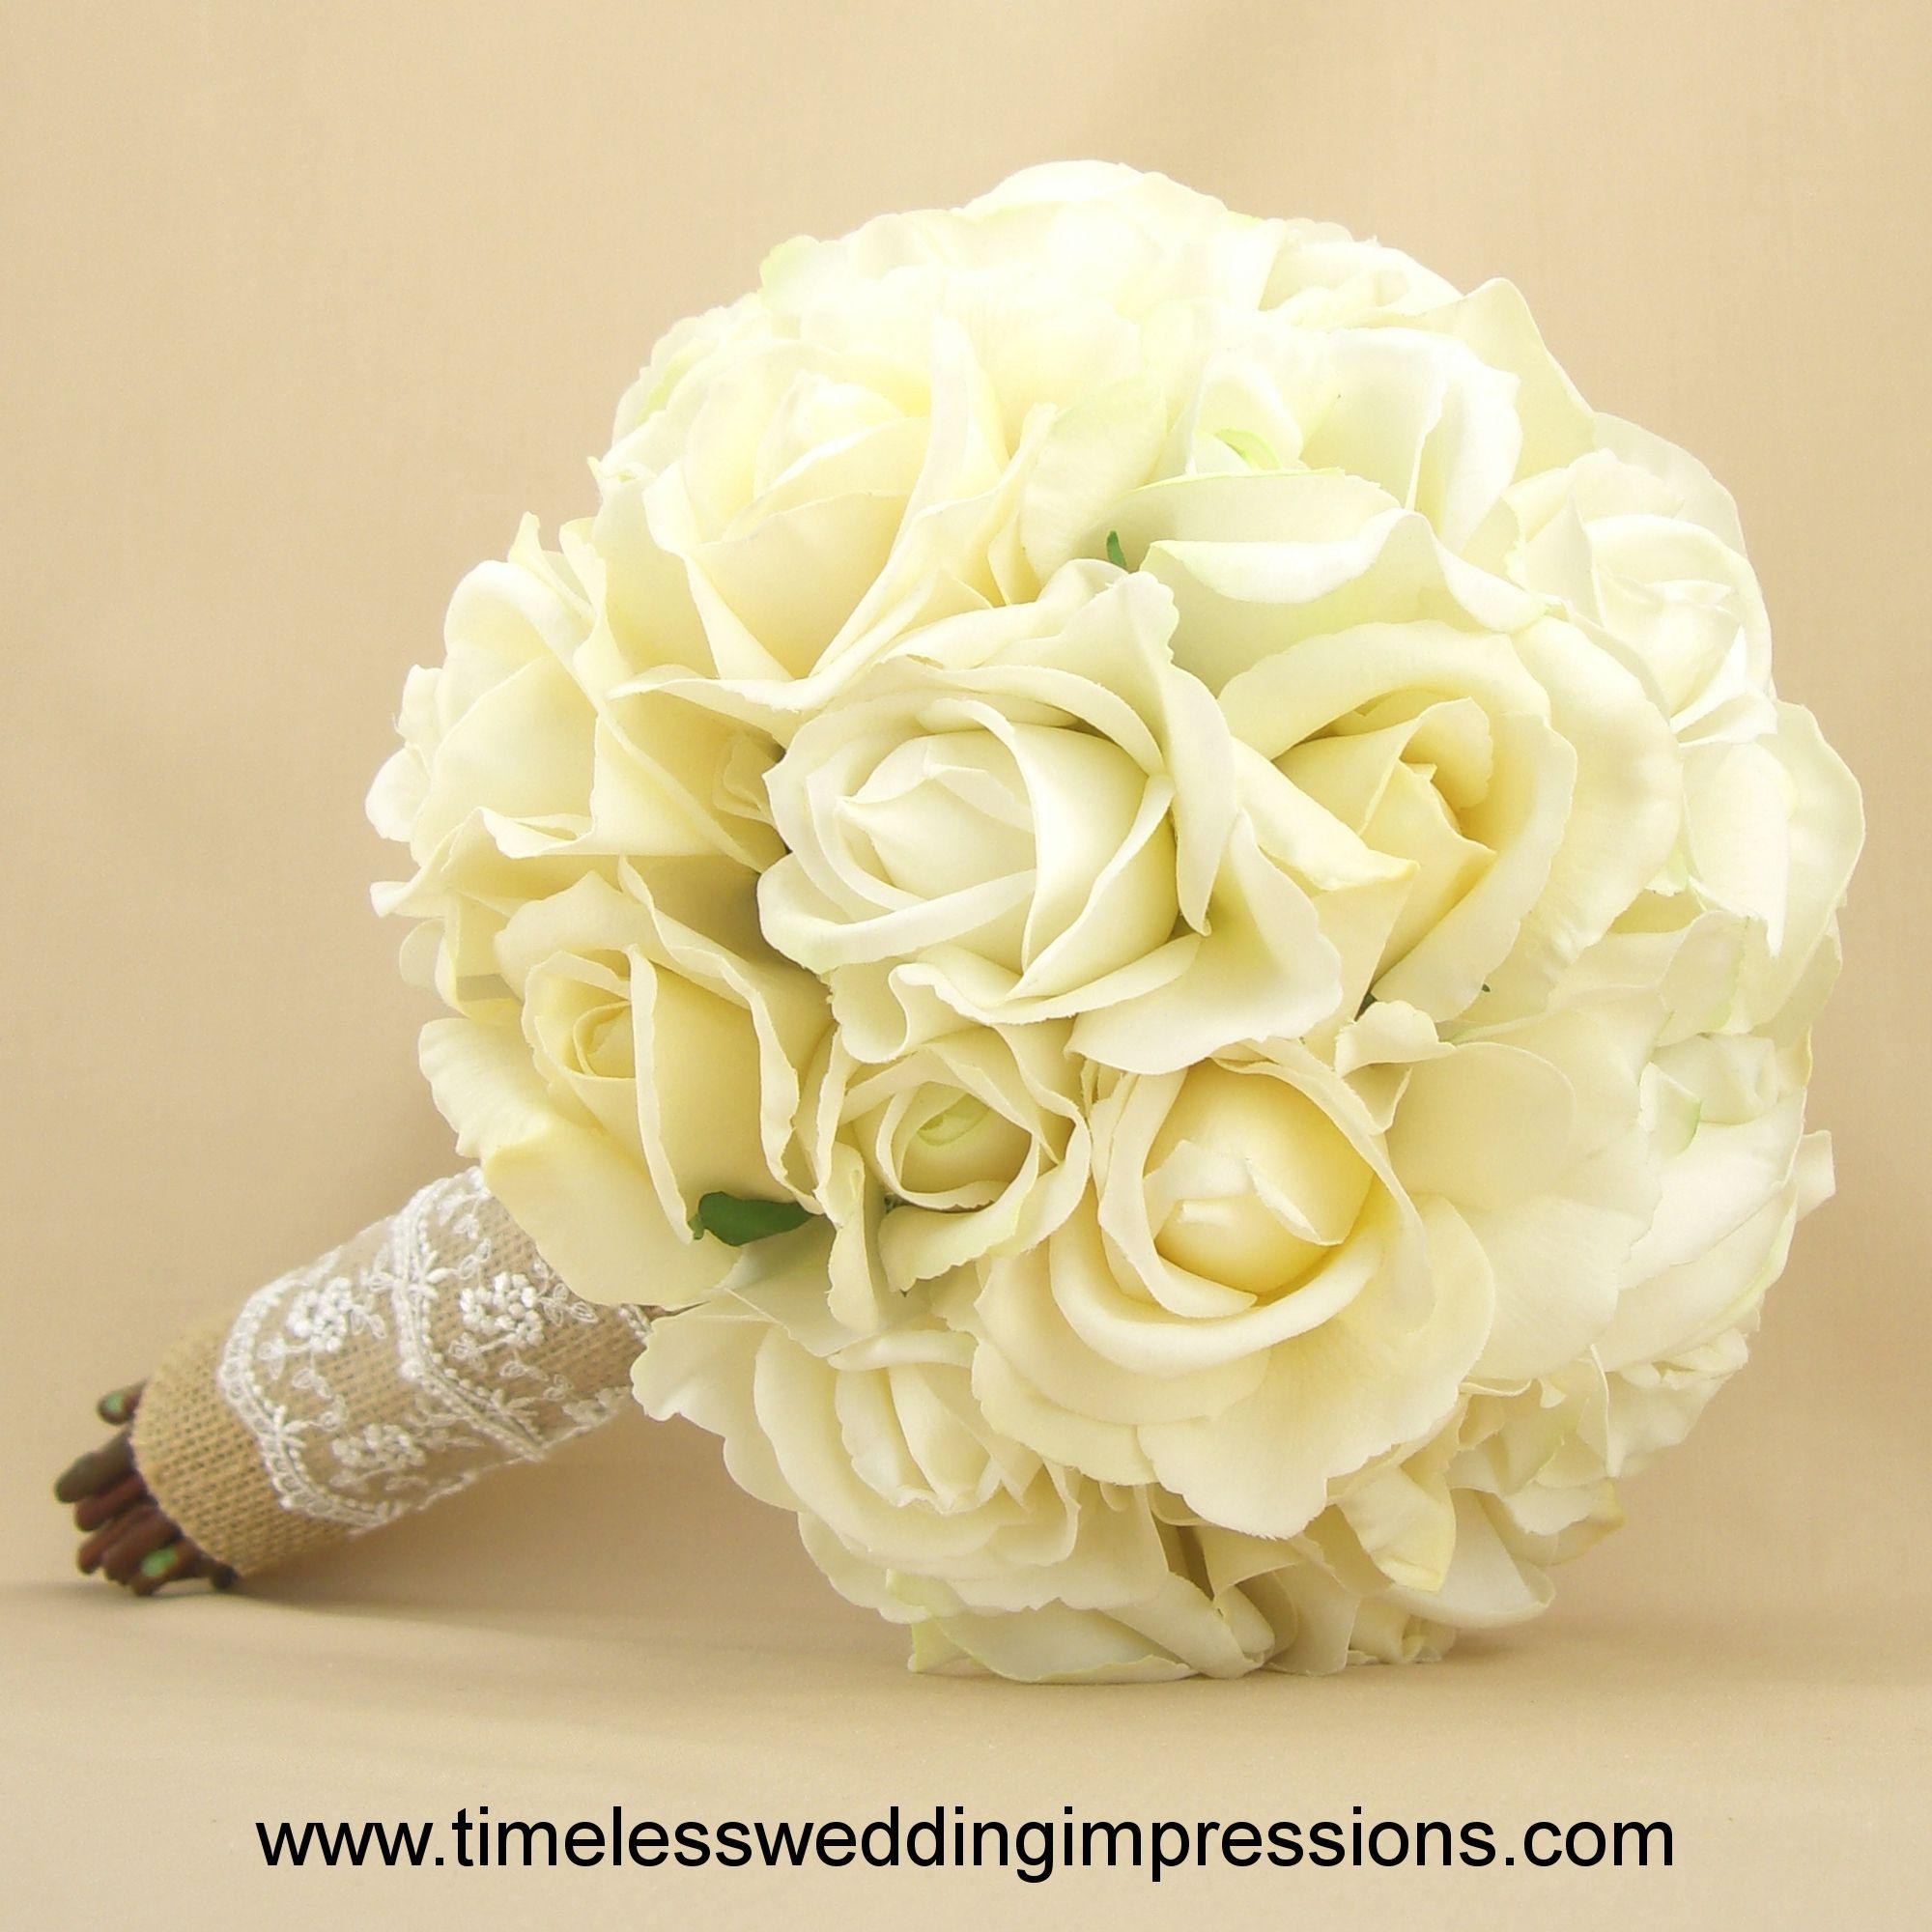 Google image result for httptimelessweddingimpressions skinfrontenddefaultdefaultimagesrustic bridal bouquet burlap lace roses rosebuds white cream ivory real touch silk wedding flowersg mightylinksfo